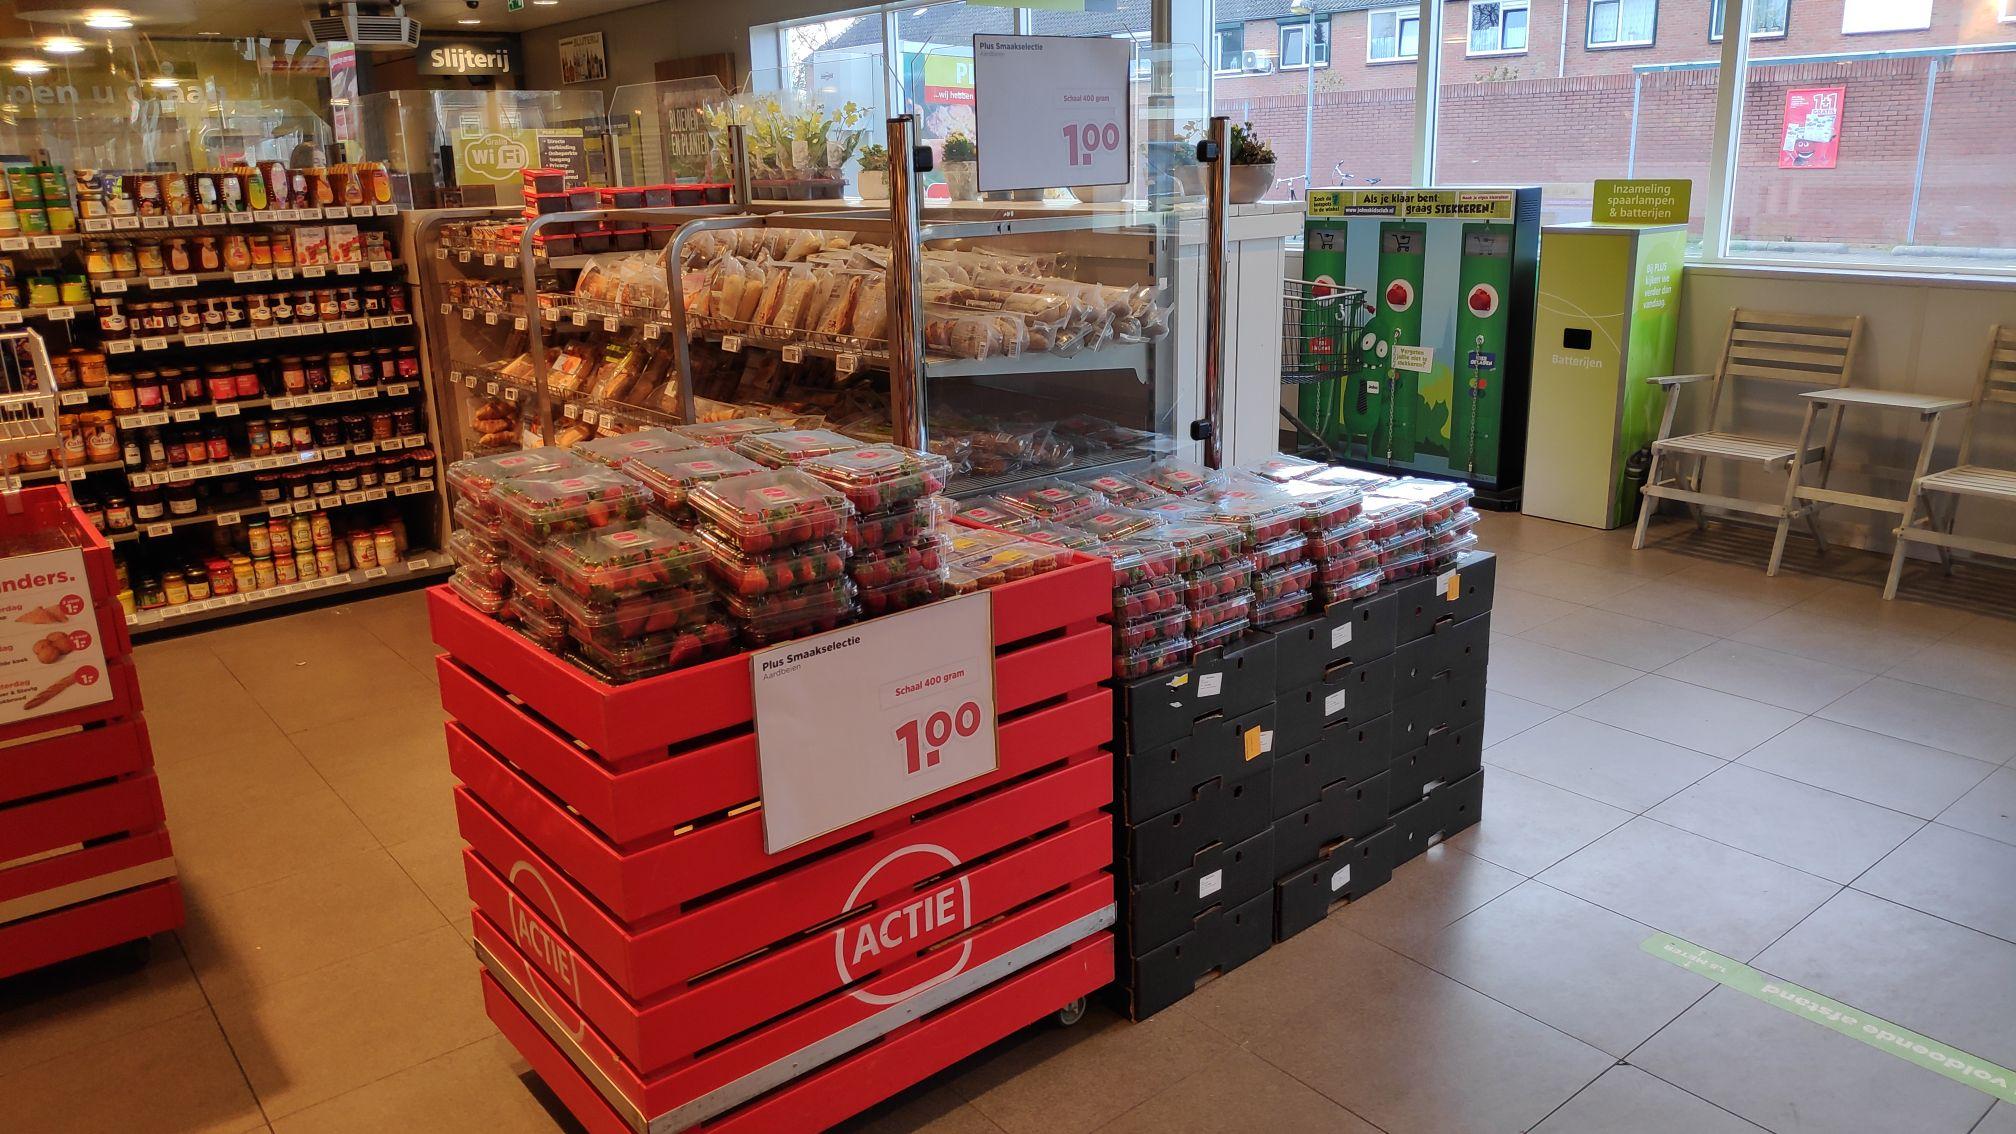 [Lokaal] Hengelo (Gld) Aardbeien €1,00 per bak